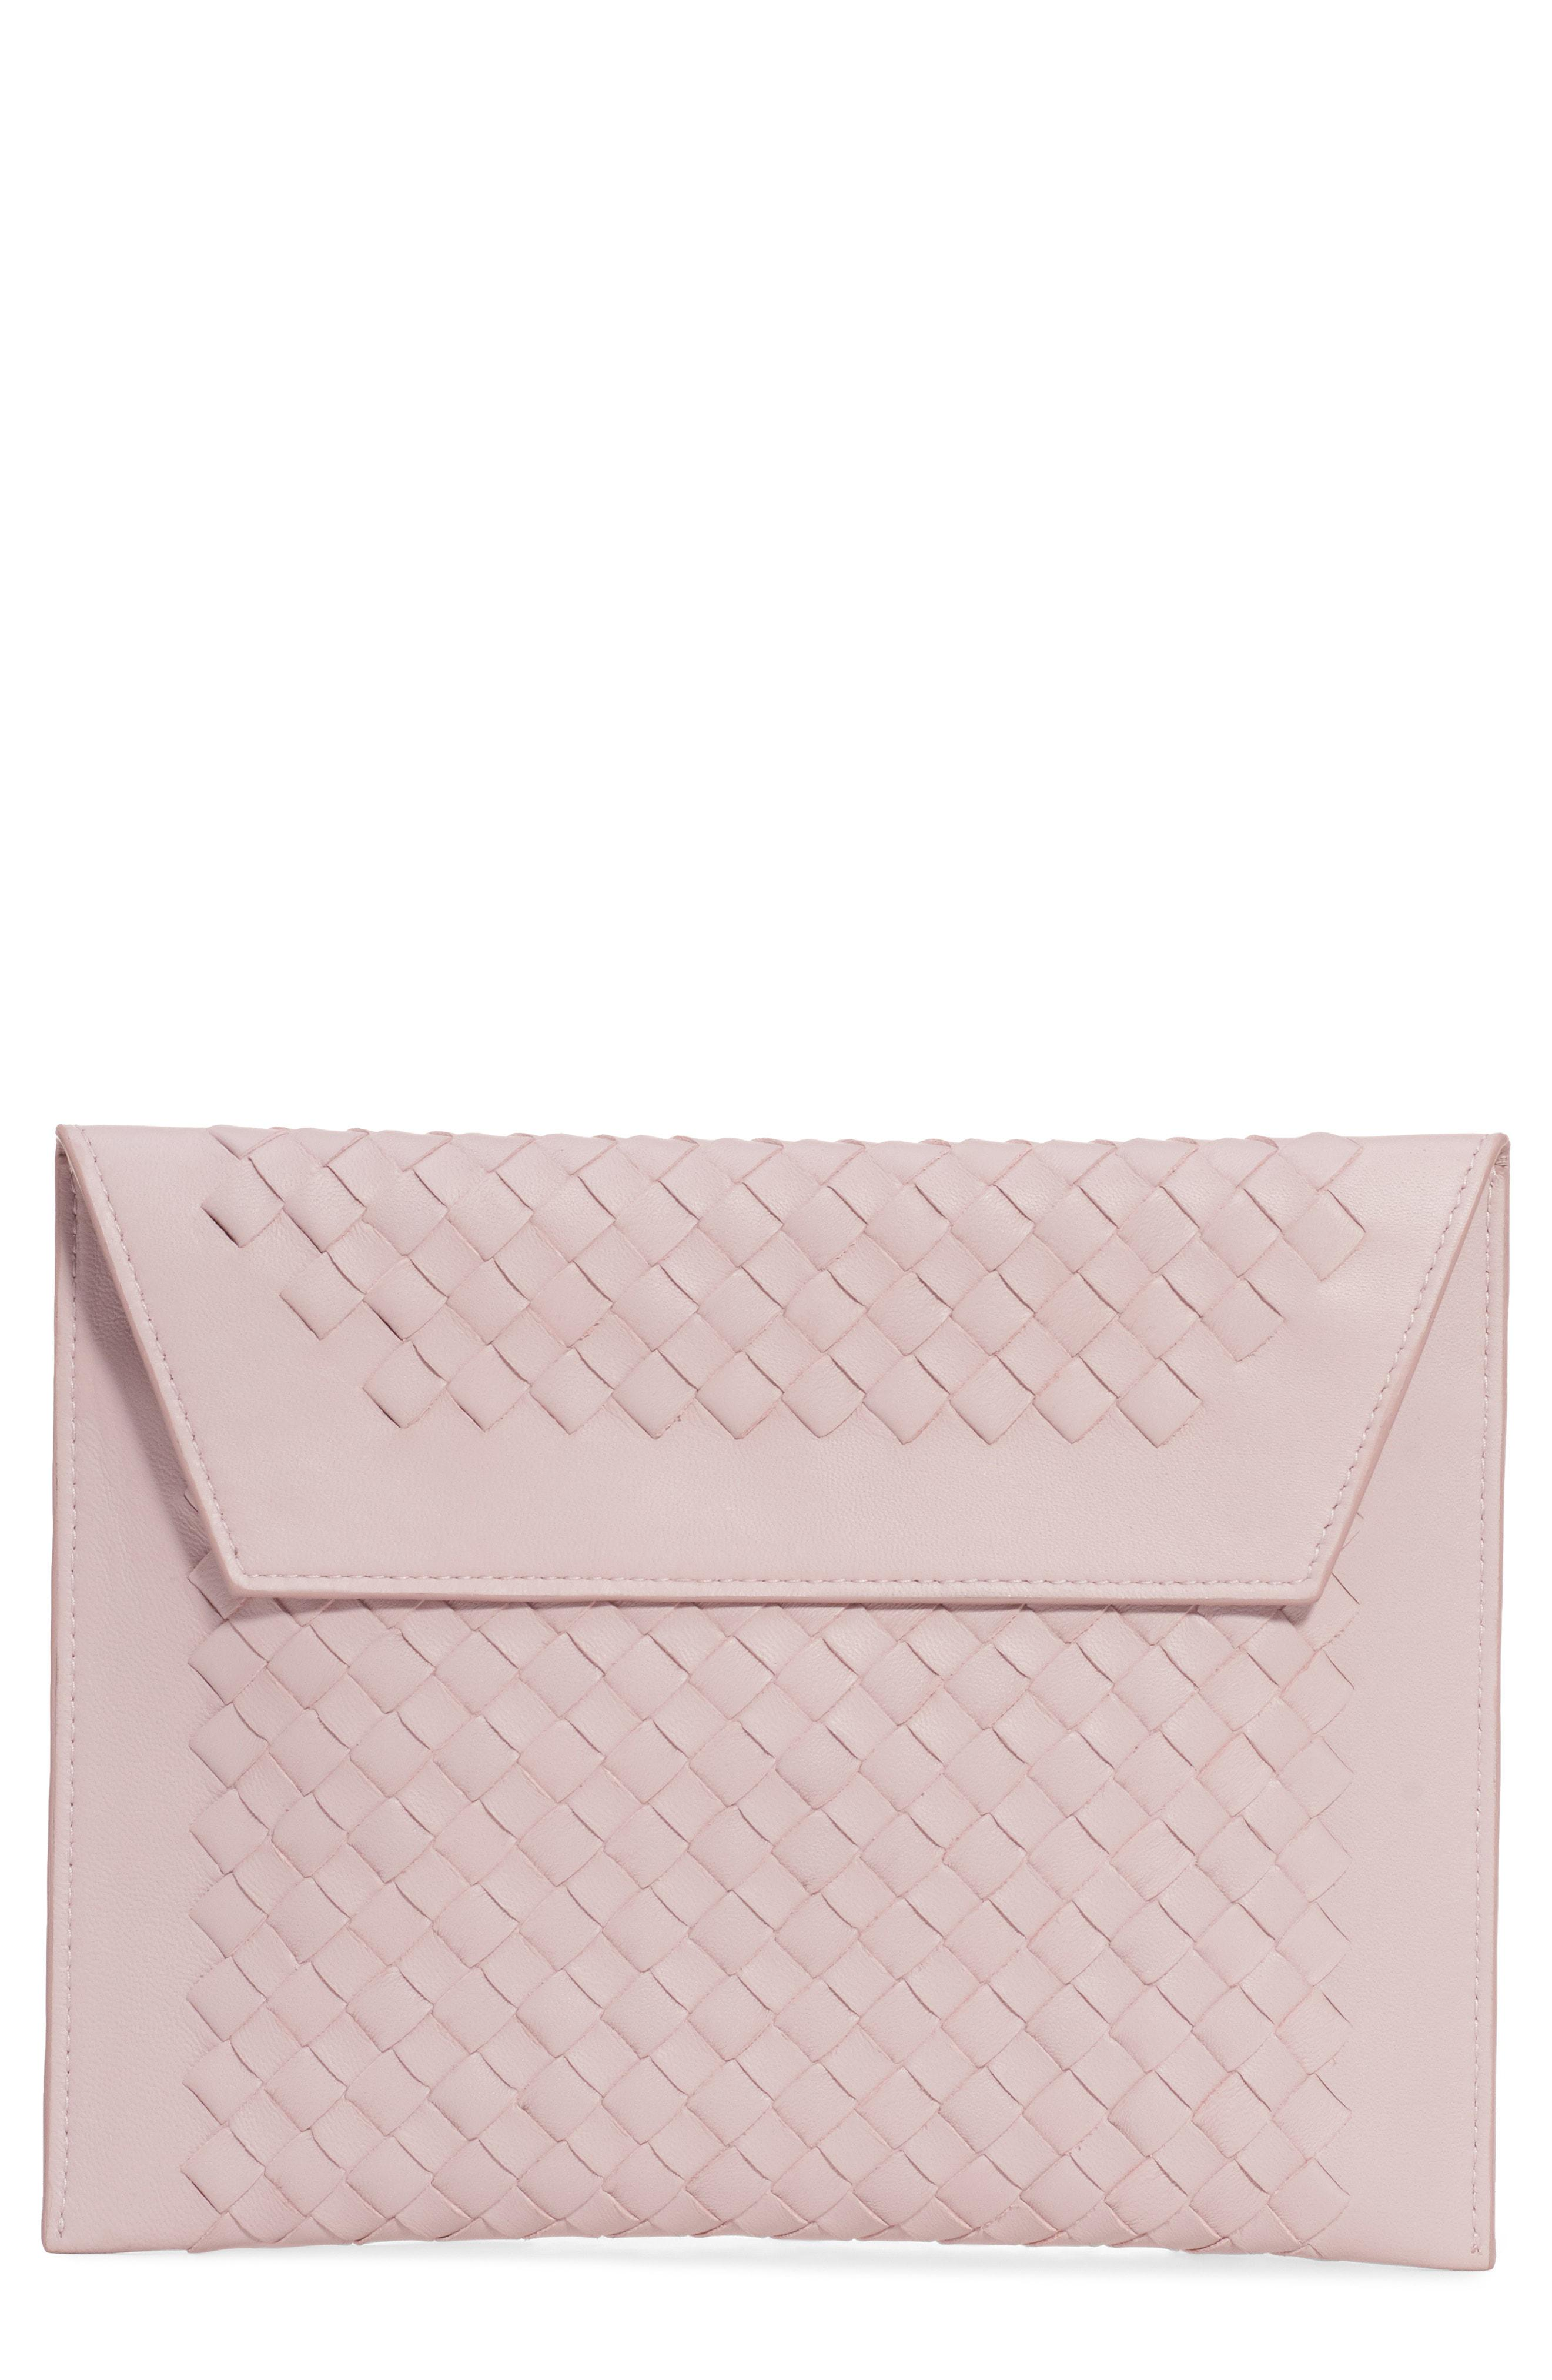 8004f36d0337 Lyst - Bottega Veneta Set Of 3 Nappa Leather Pouches - in Pink